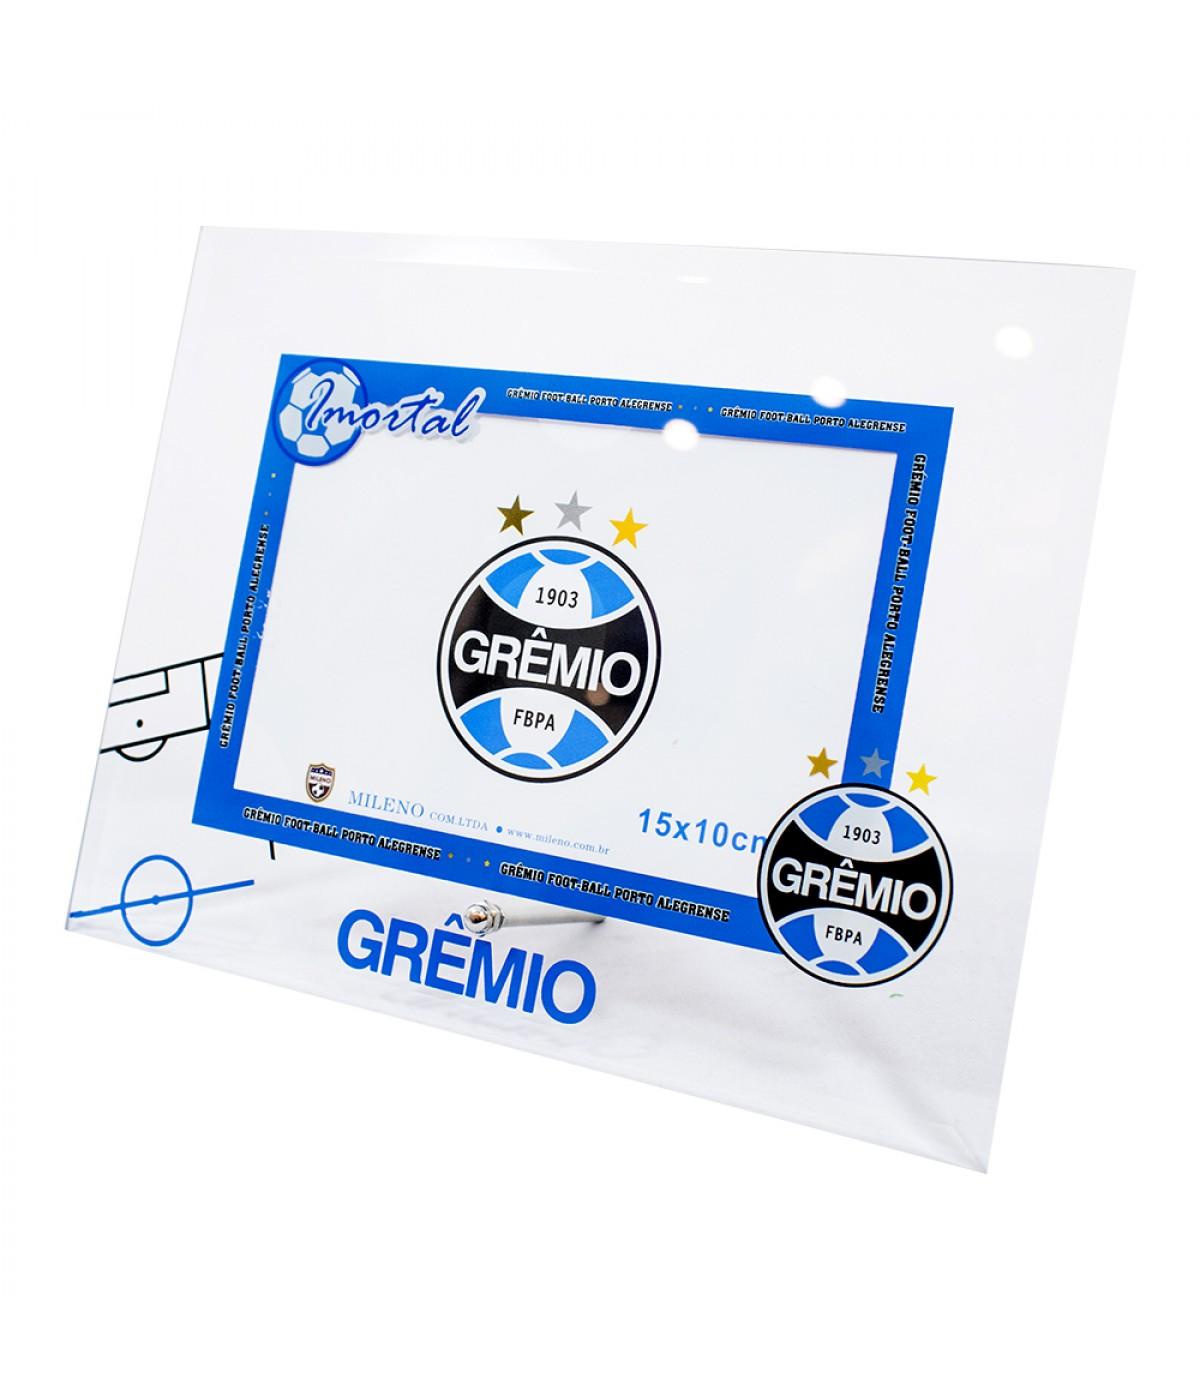 PT RET - GREMIO